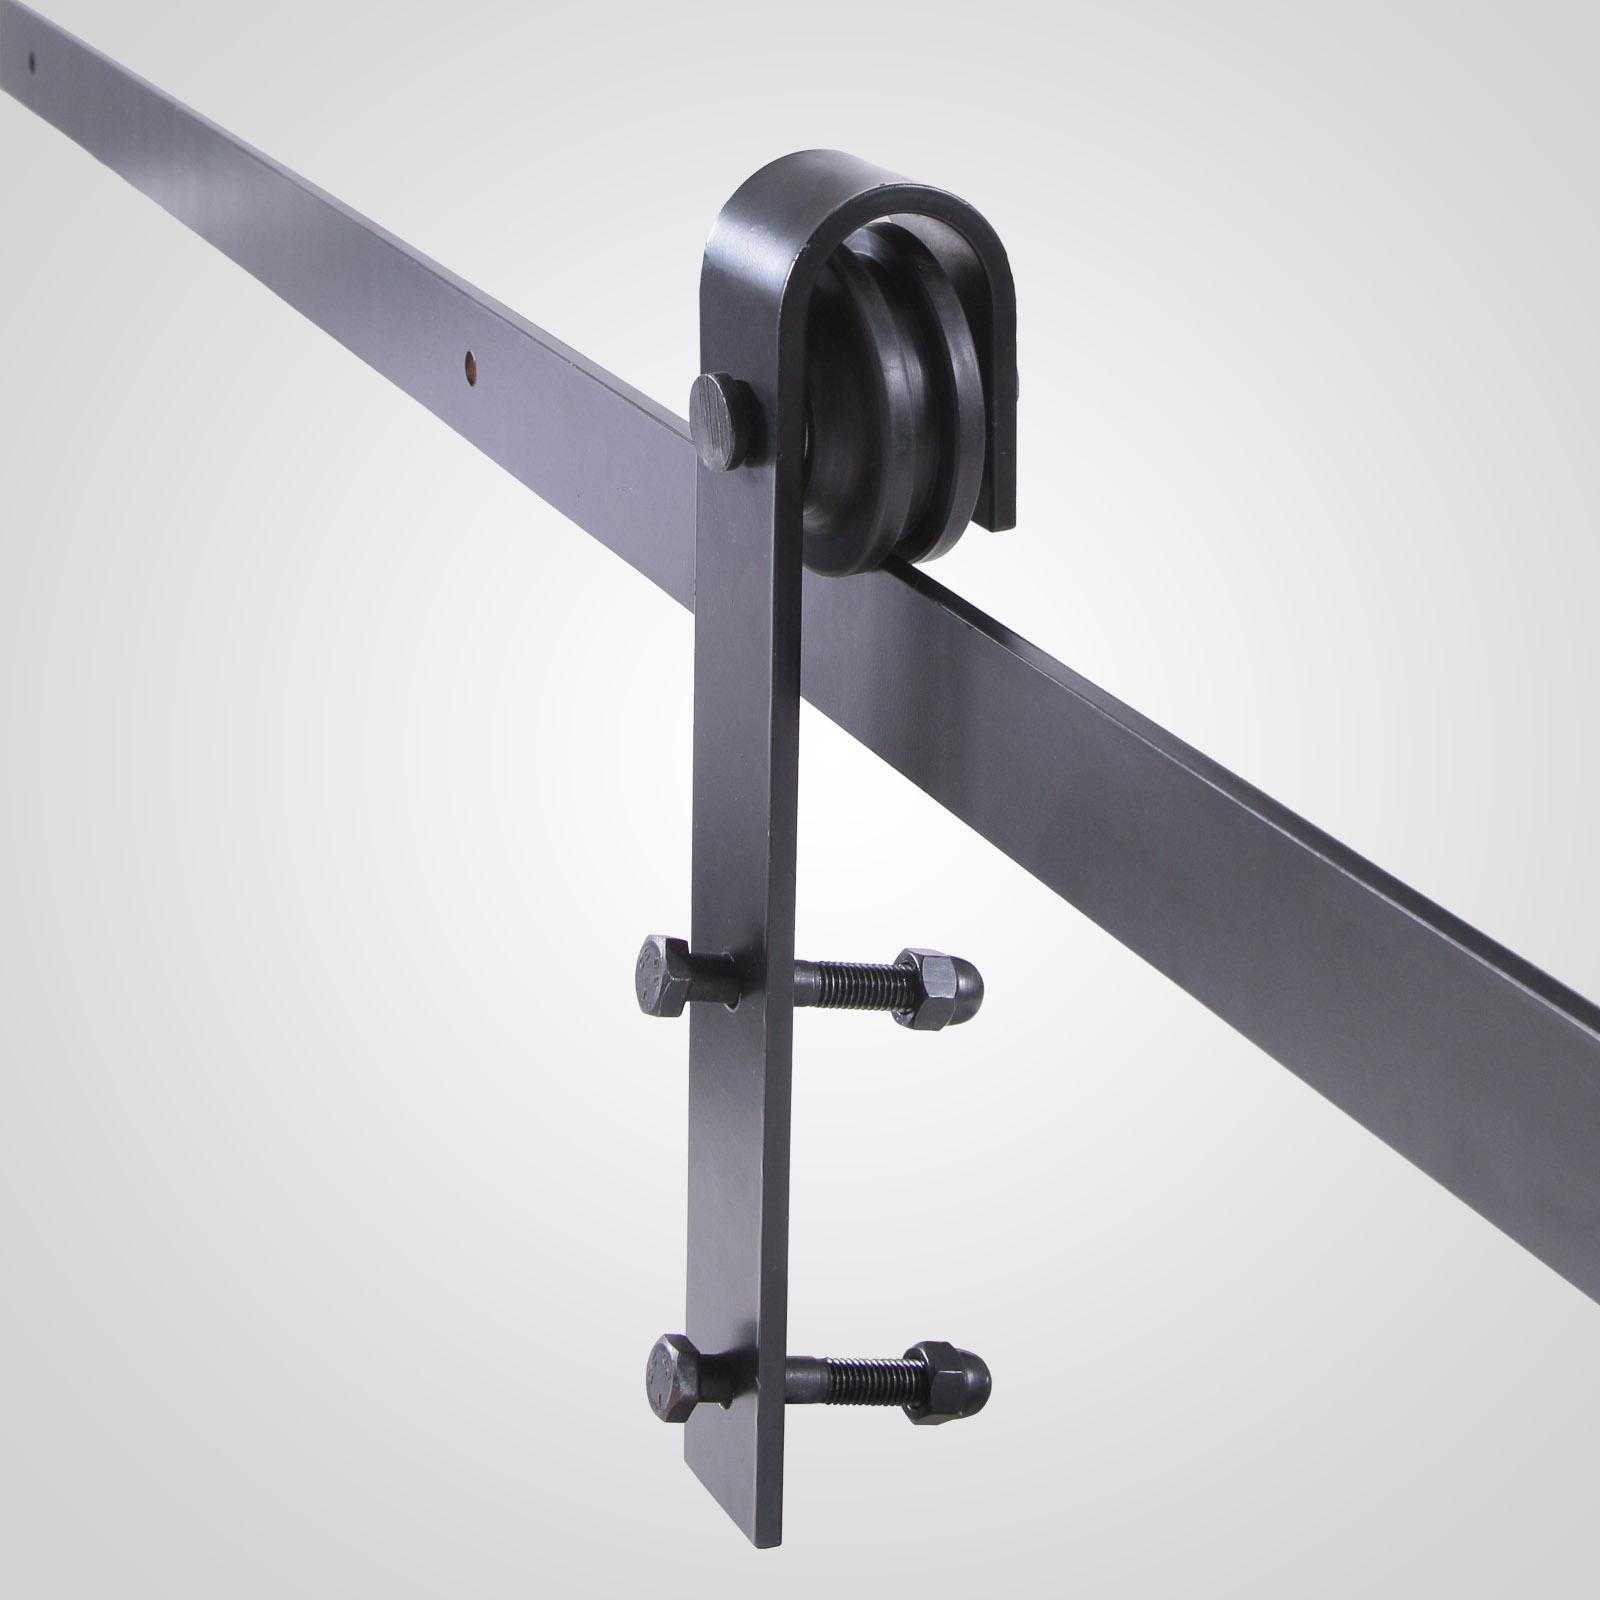 Wall mount sliding door hardware set - Black Carbon Steel Sliding Barn Door Hardware Track